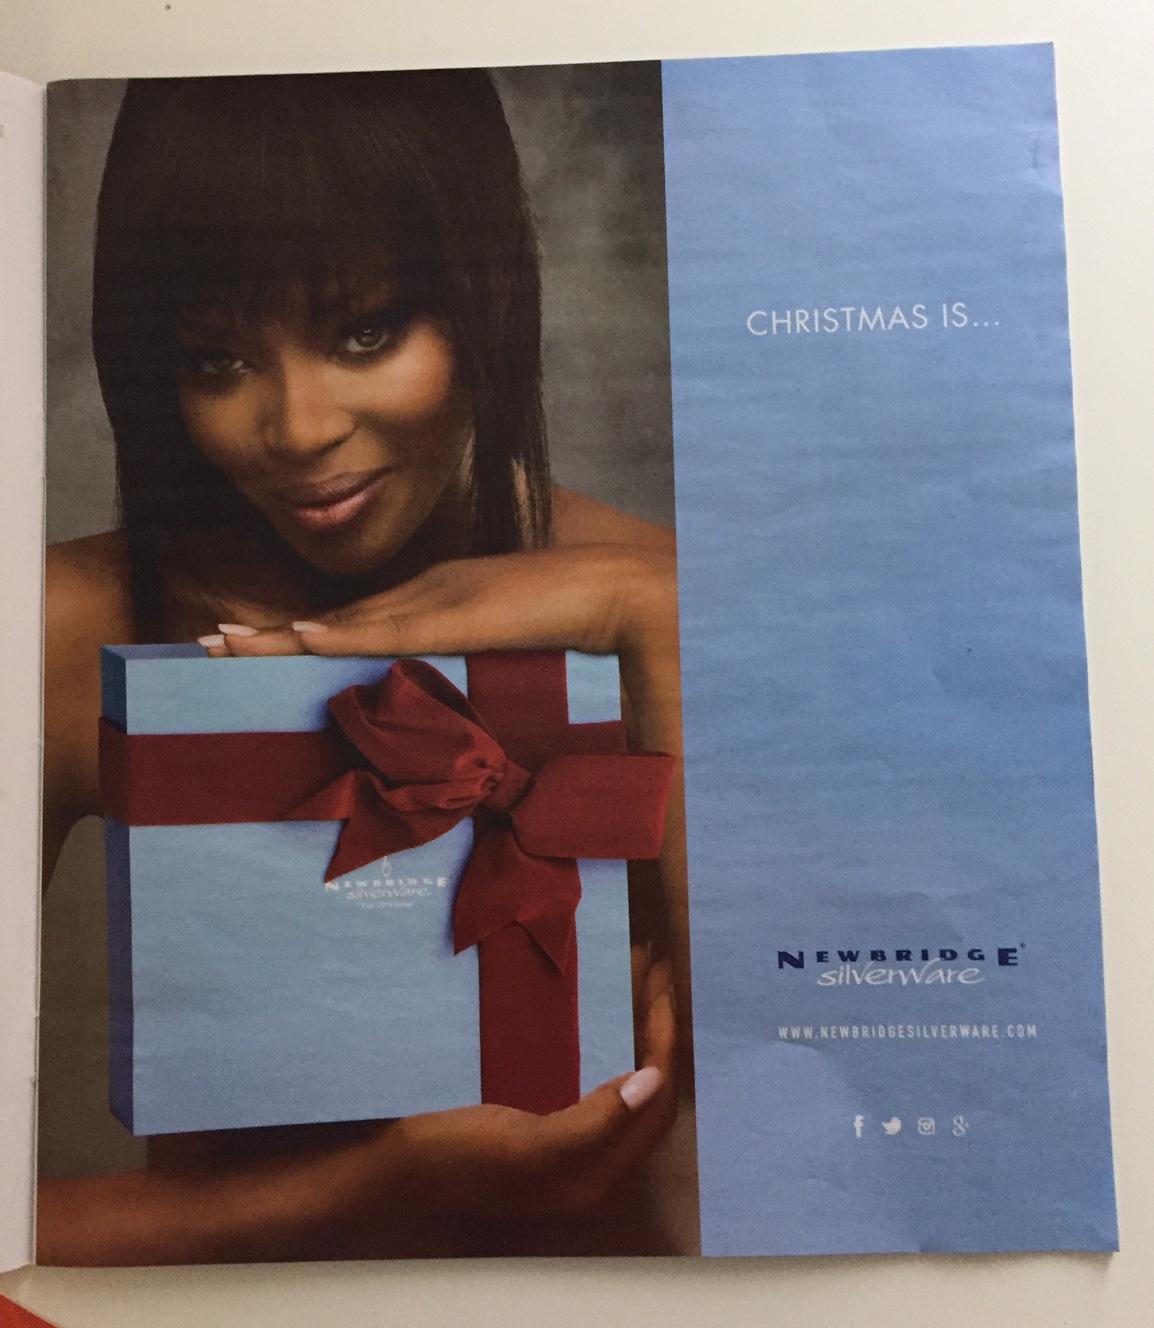 Newbridge Silverware – Christmas is